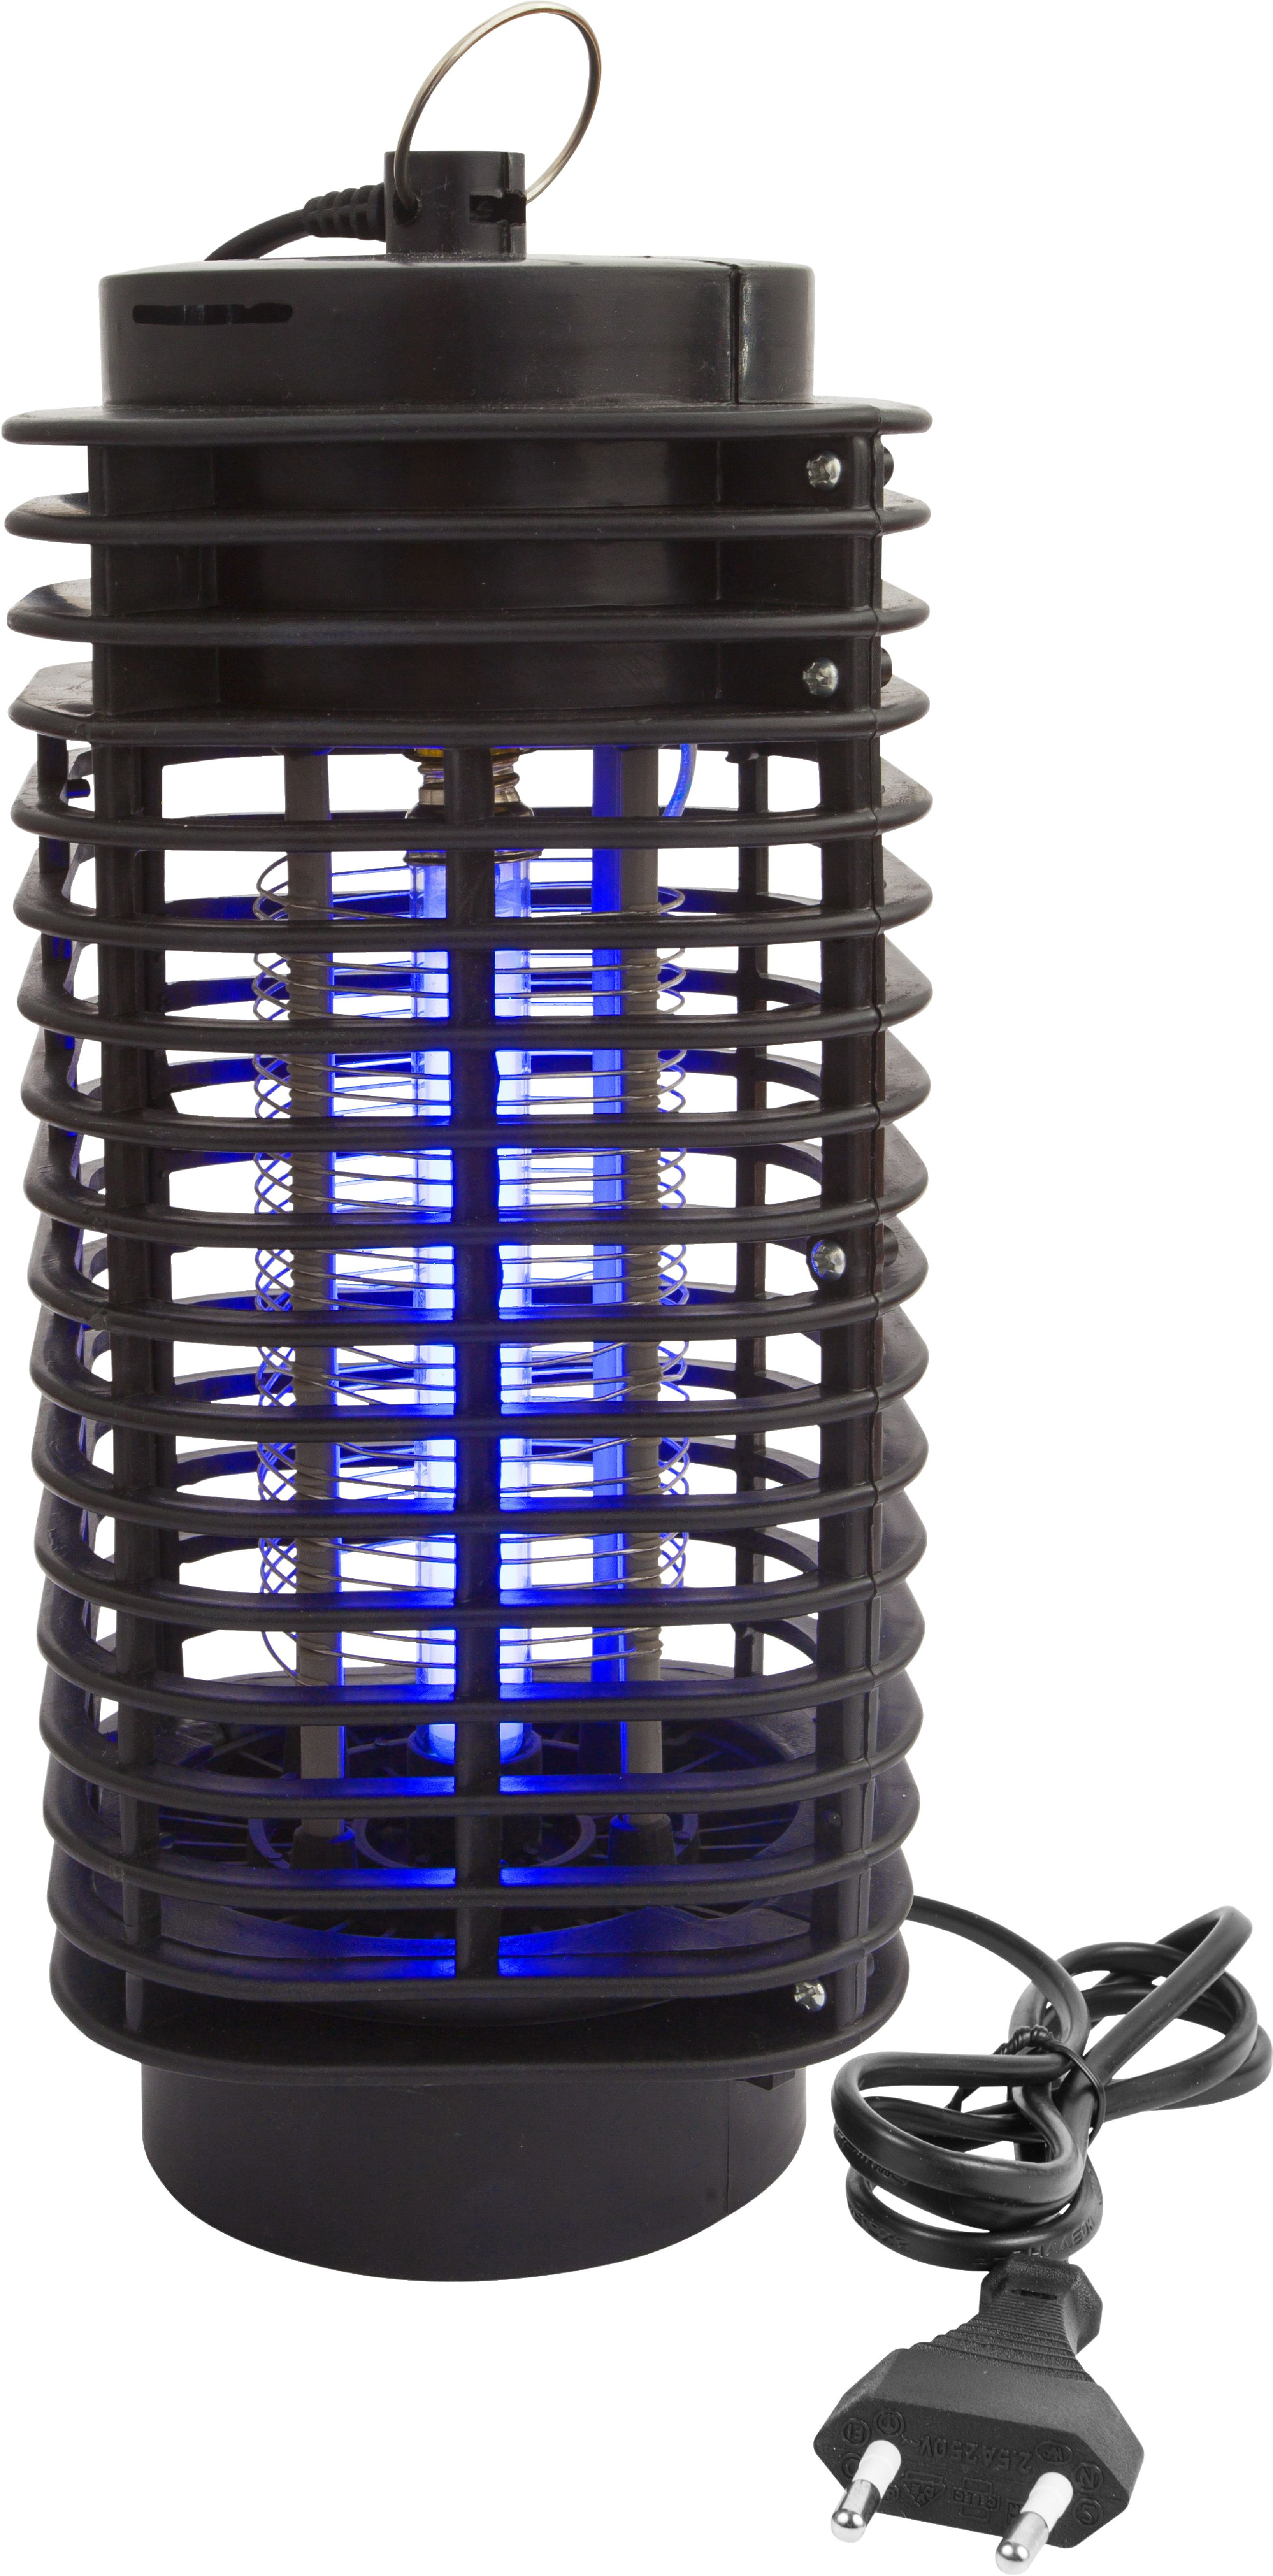 UV lapač hmyzu 3 W, 16m2, Biogrod 73109